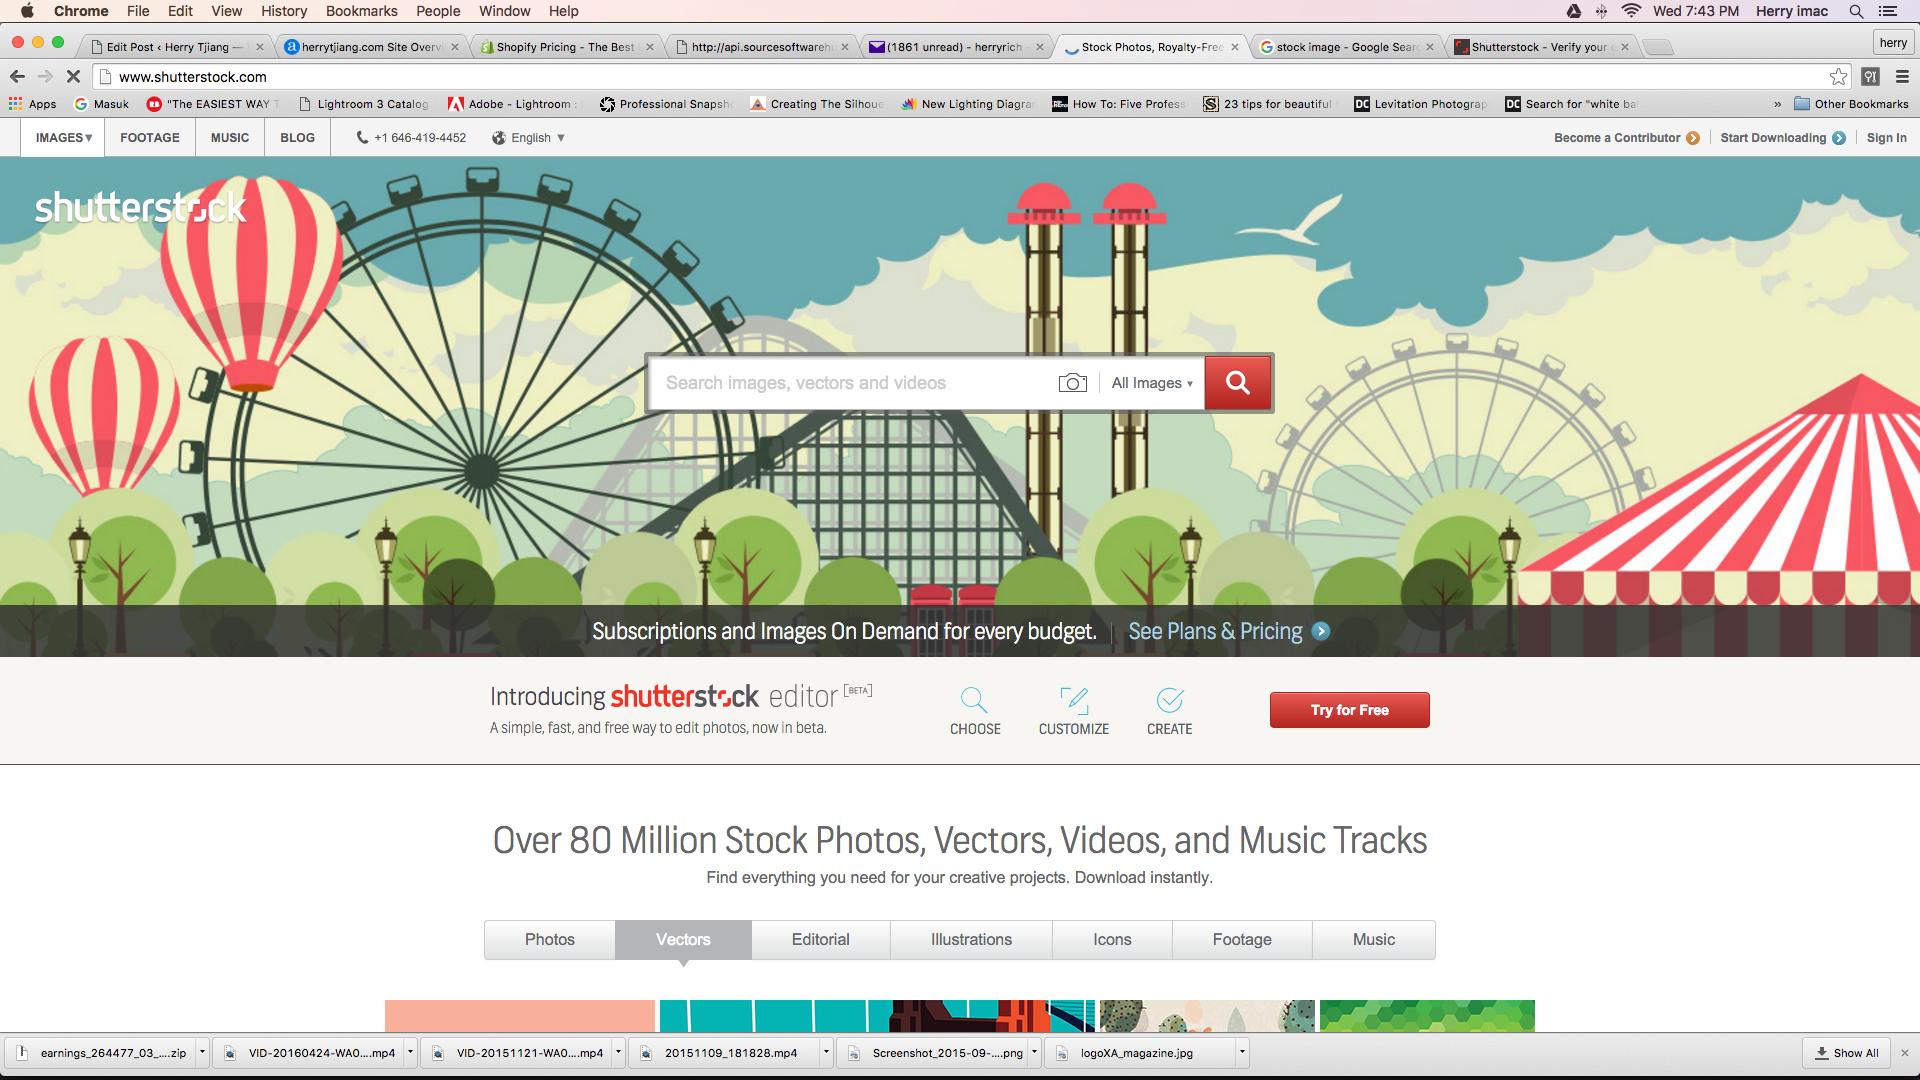 Shutterstock image bank